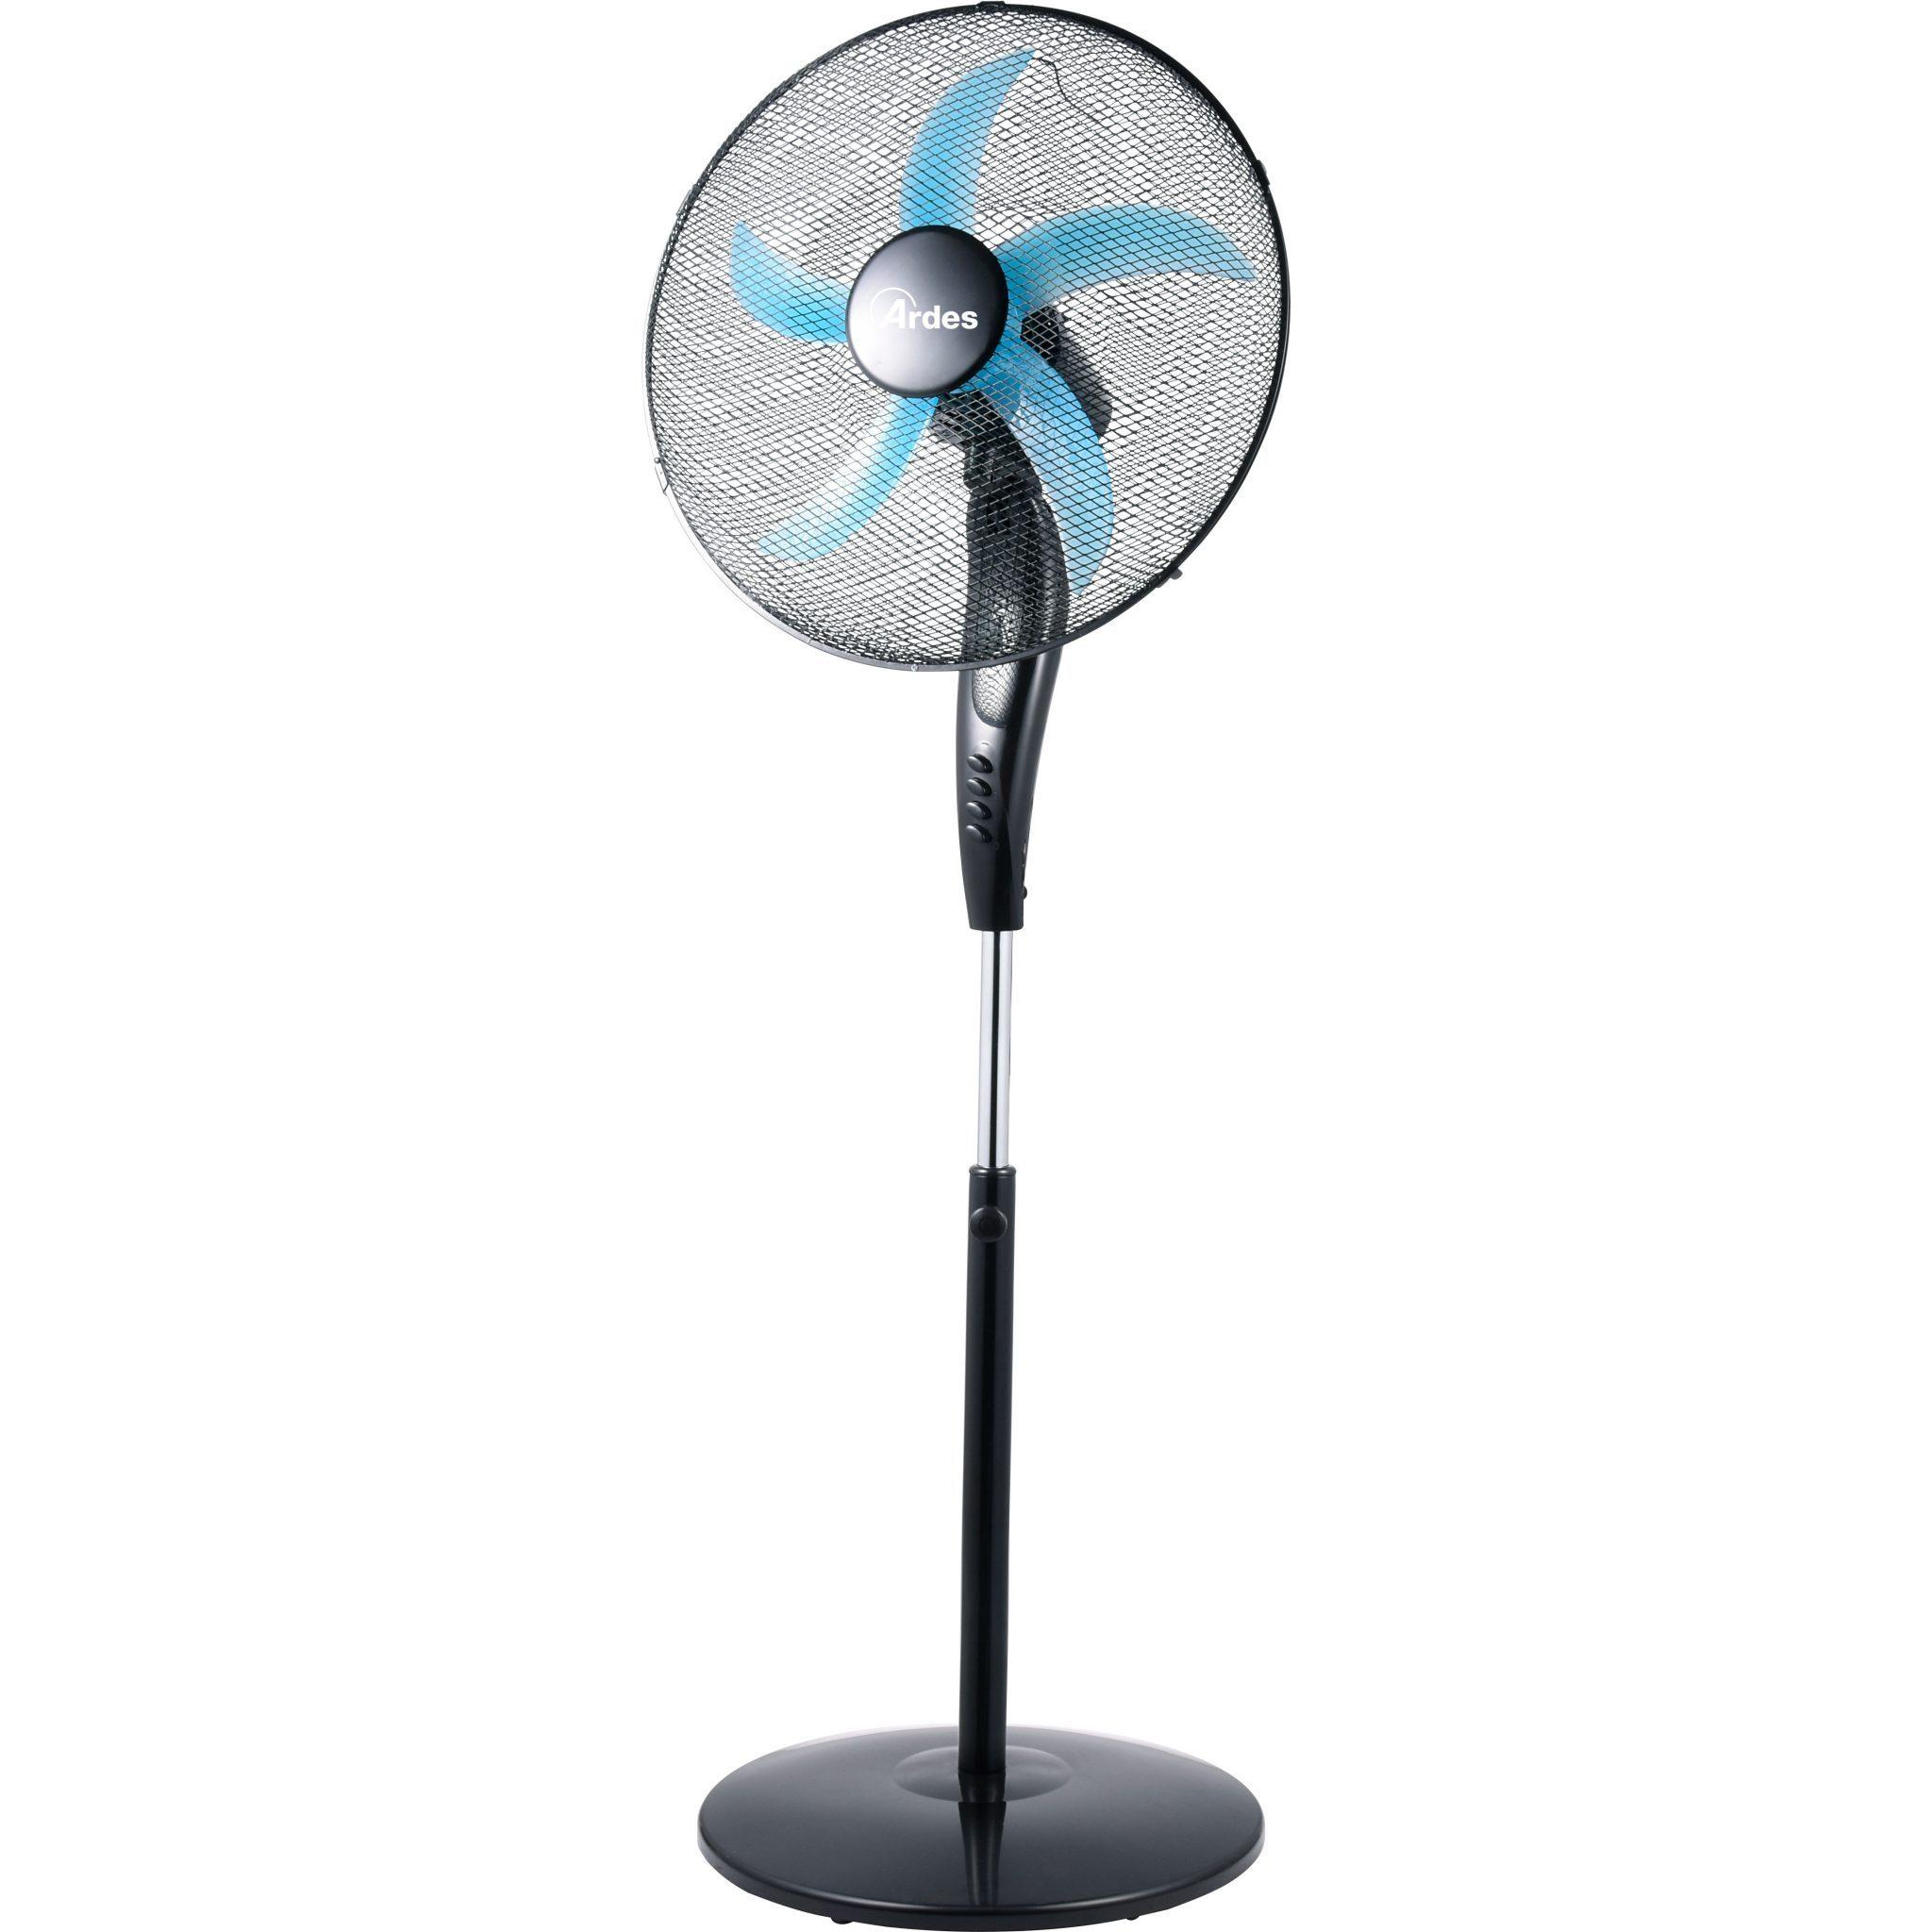 Ardes EASY 50PB ventilatore Nero, Blu